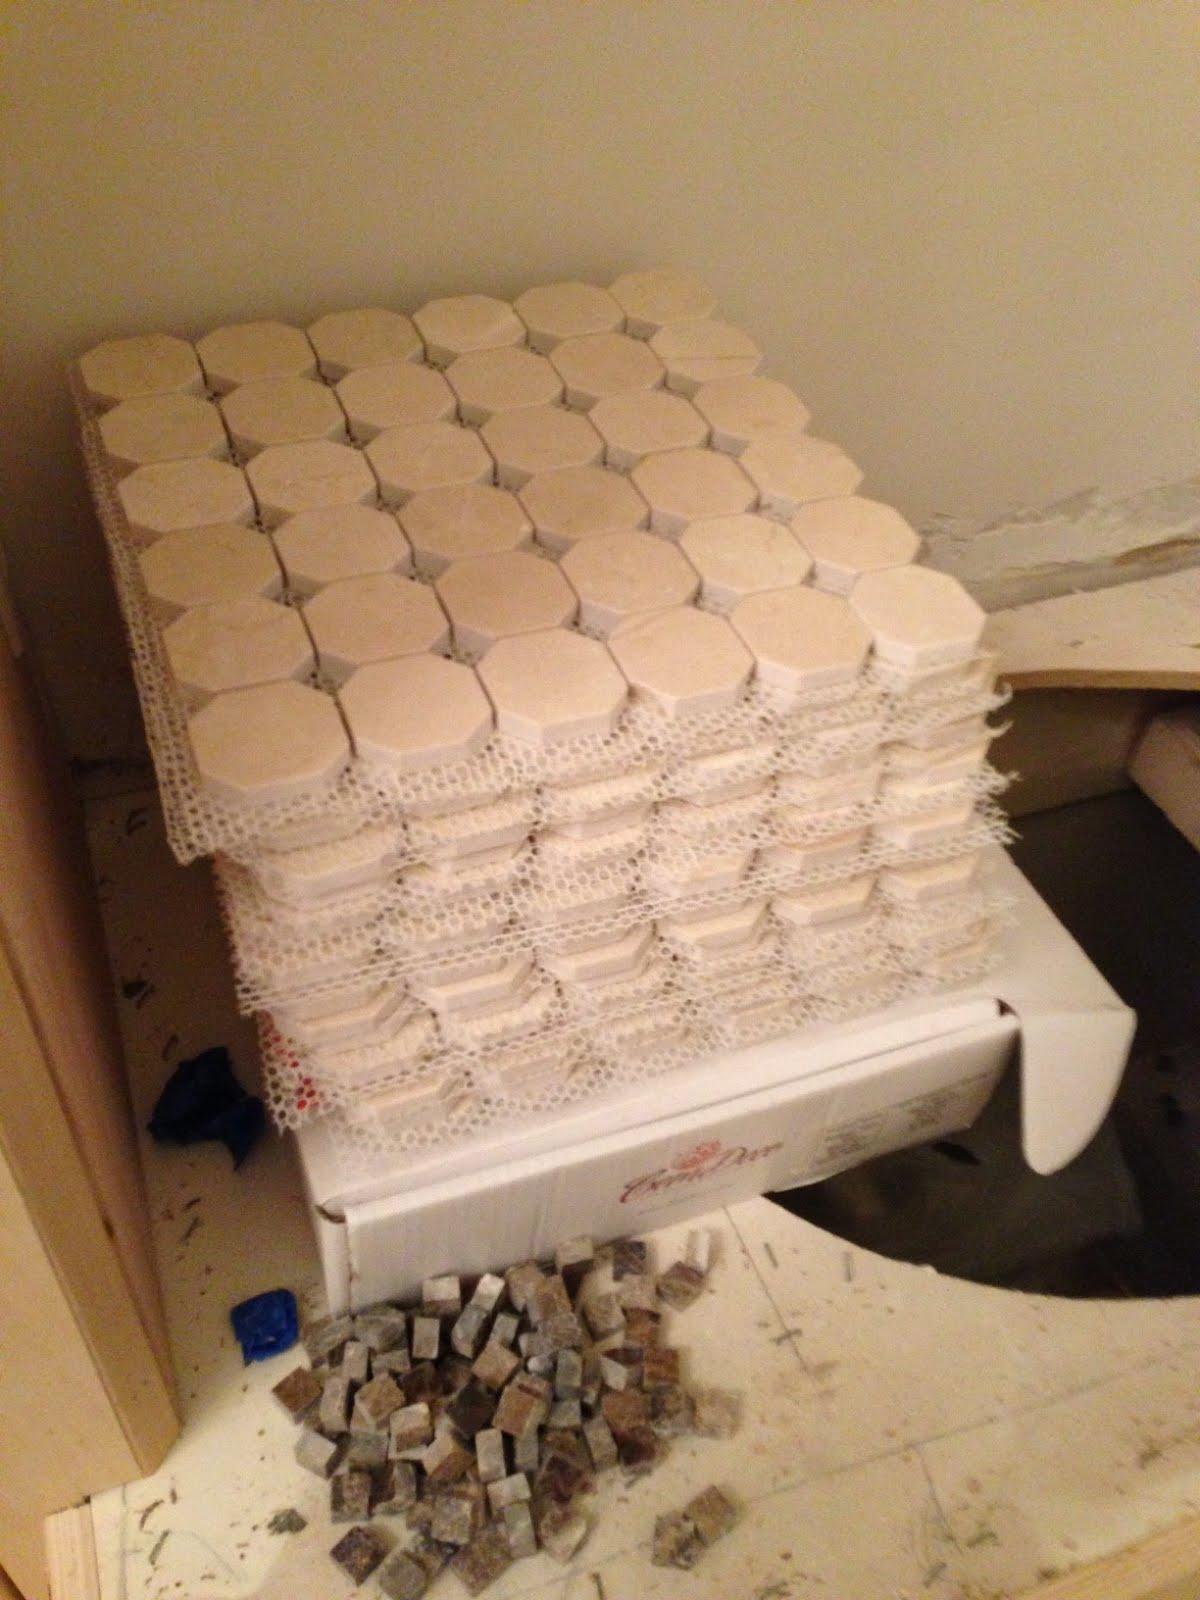 Article ➤ http://CarlaAston.com/craving-mosaics (DESPERATELY) CRAVING MOSAICS | (KWs: tile, bathroom, texture, emperador, wallpaper)